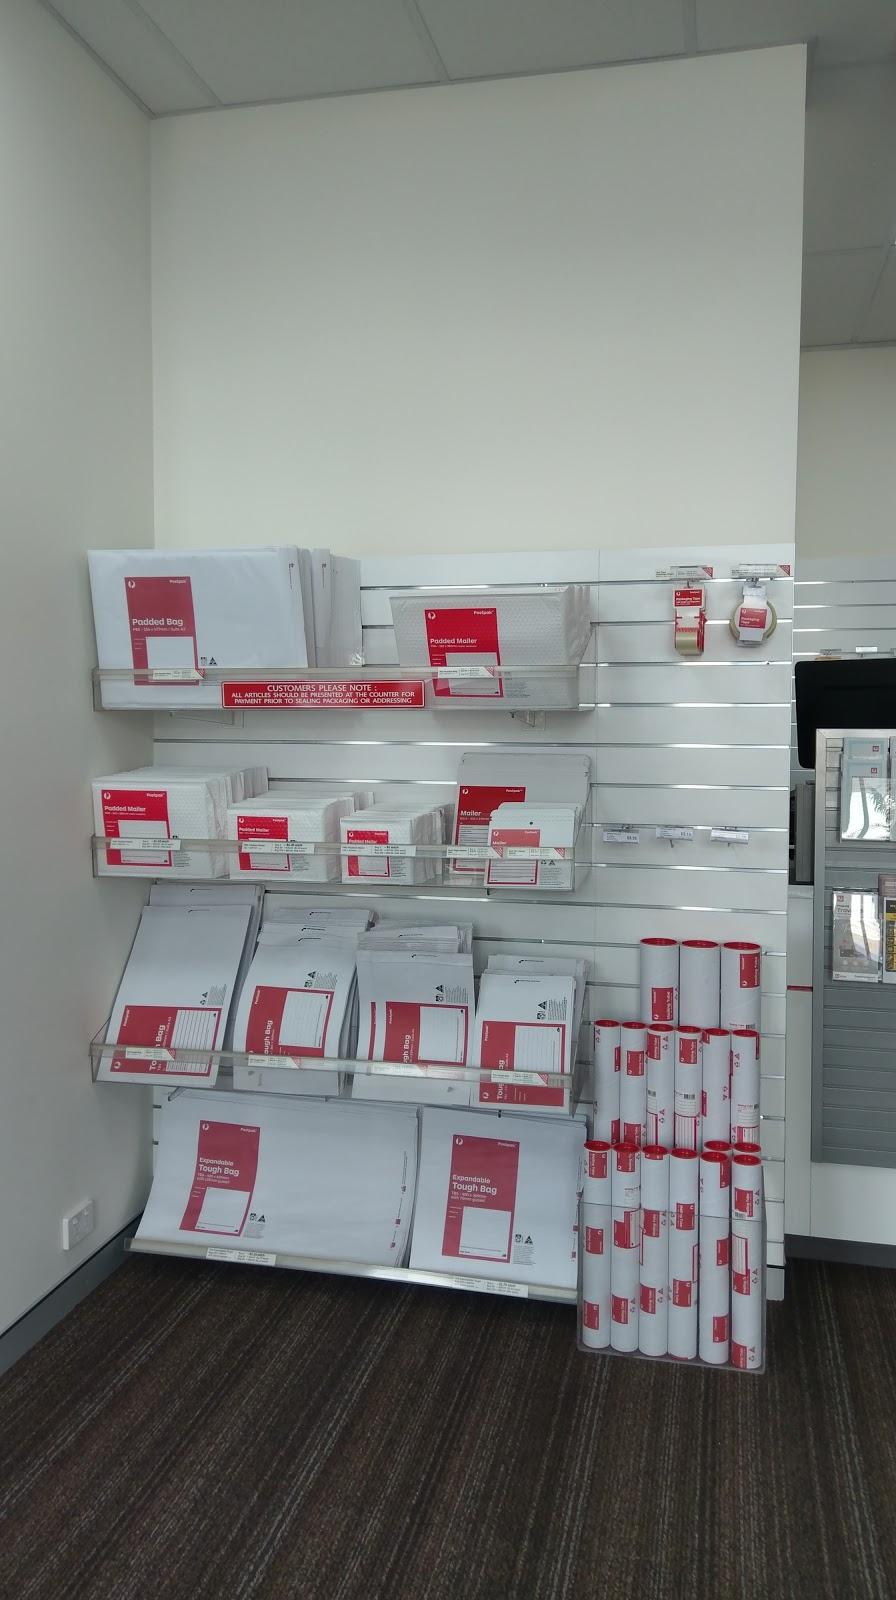 Australia Post - East Brisbane LPO | post office | 58a Manilla St, East Brisbane QLD 4169, Australia | 0733916017 OR +61 7 3391 6017